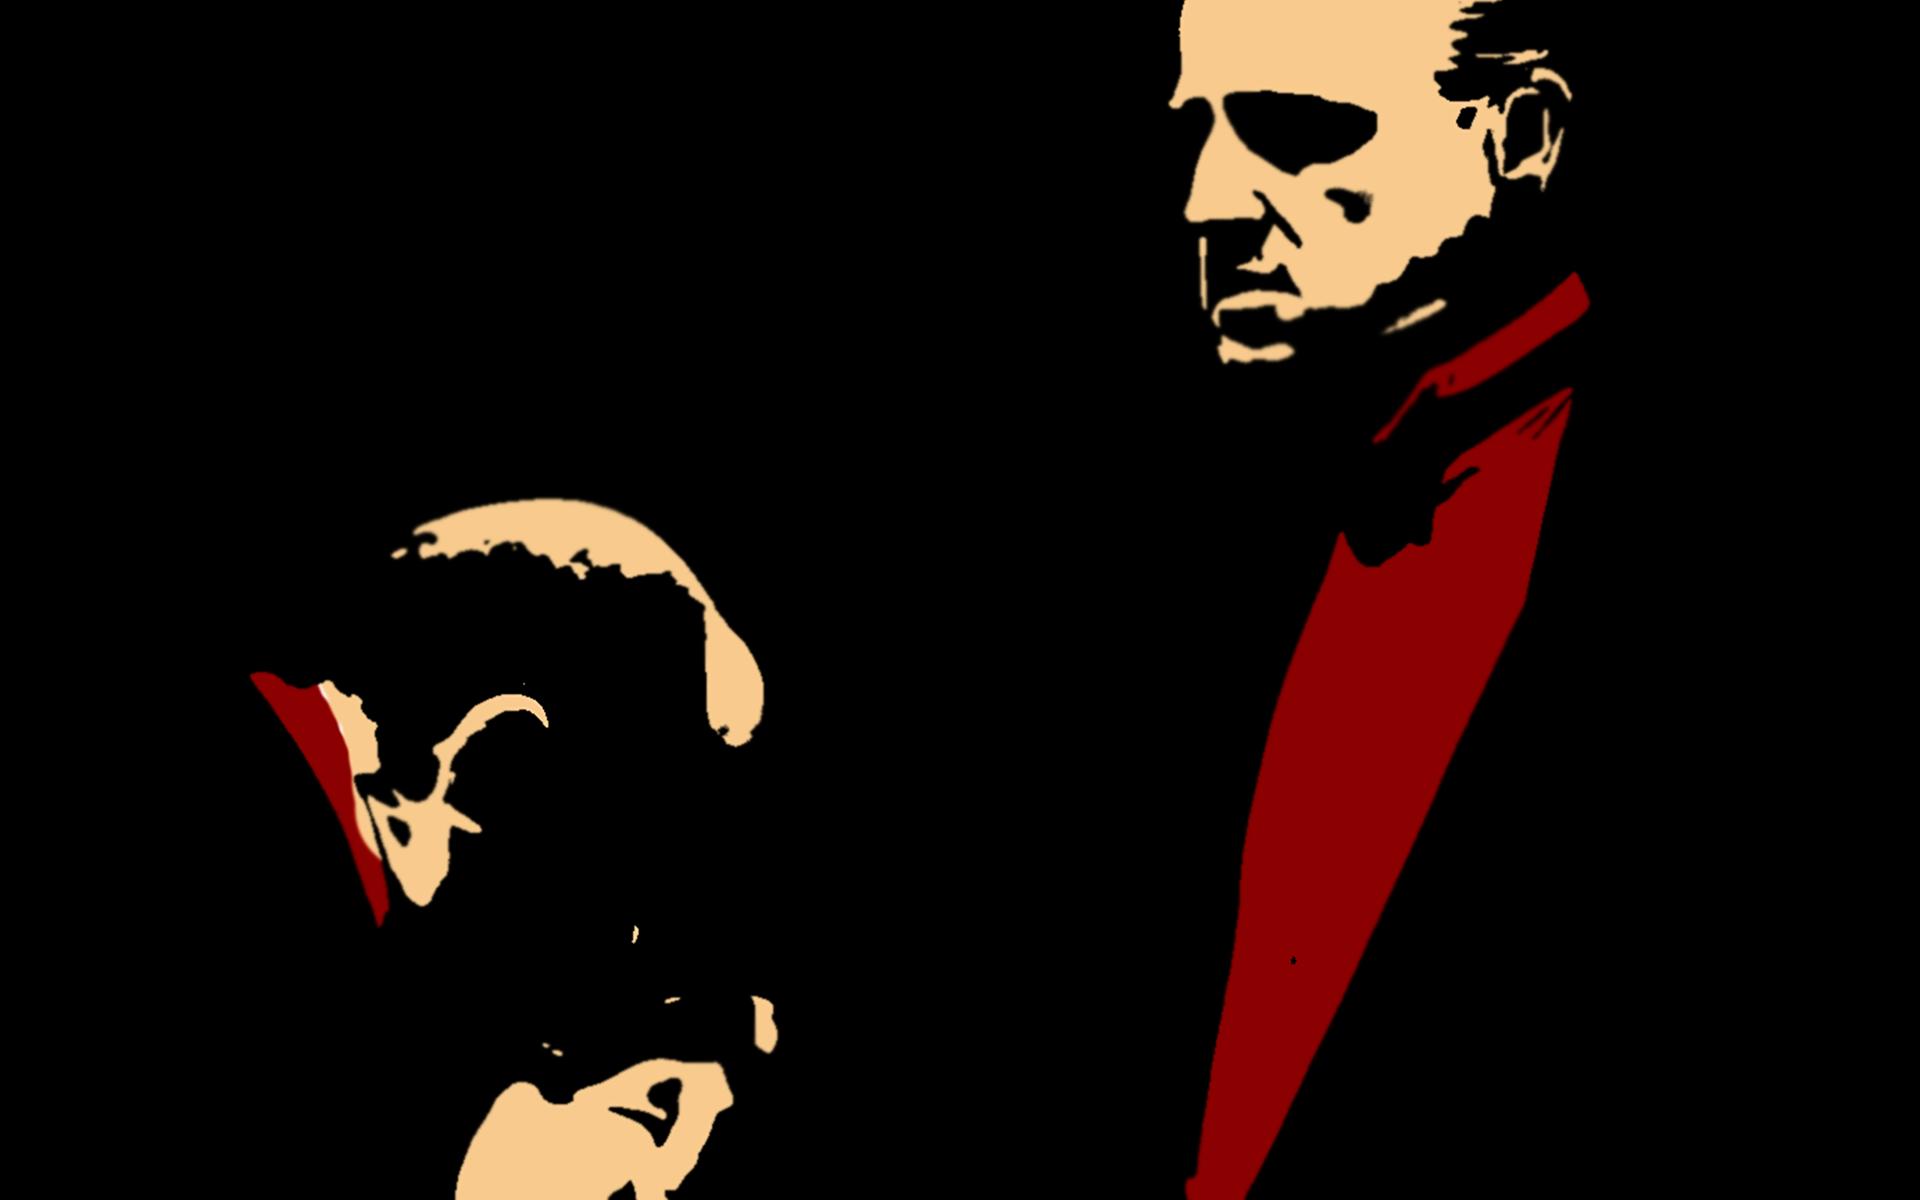 76 The Godfather Wallpaper On Wallpapersafari